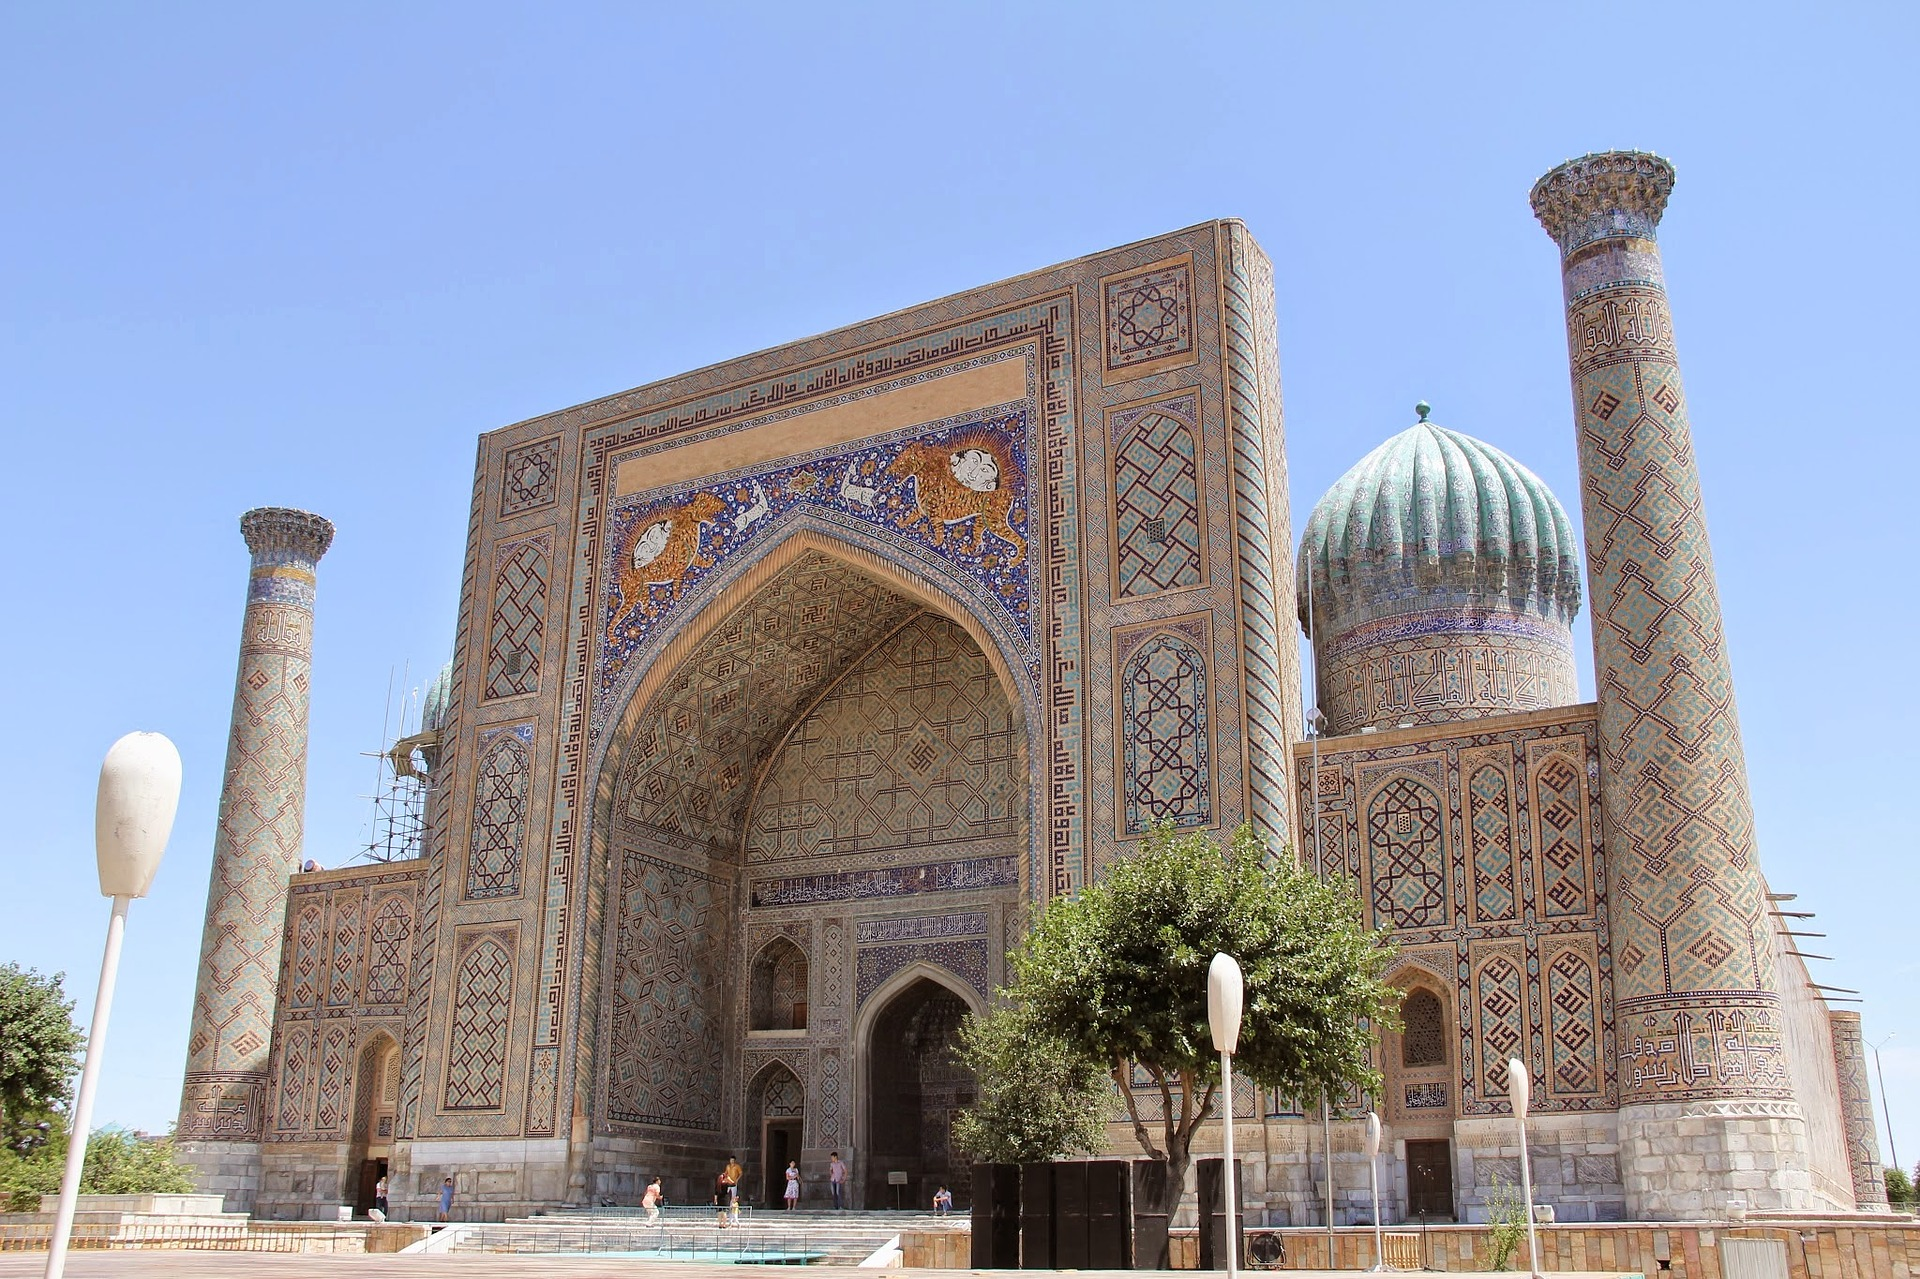 uzbekistan-2636505_1920.jpg